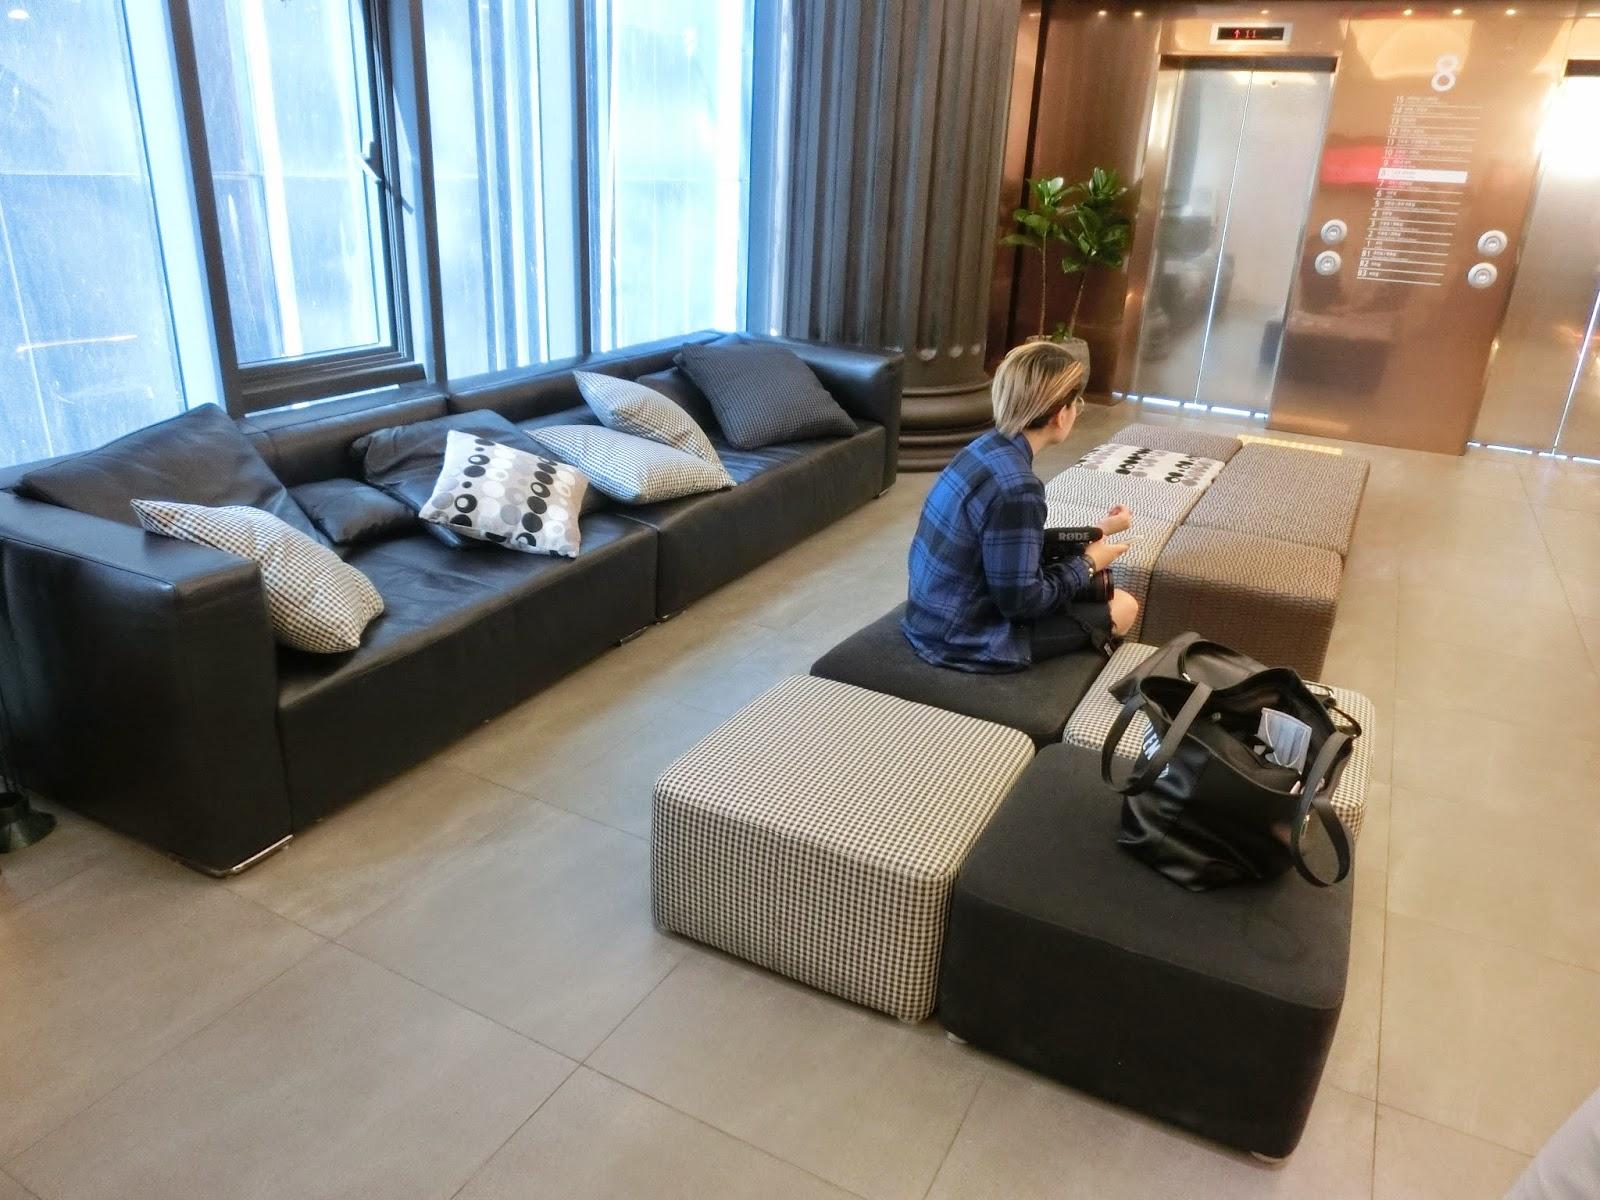 grand-post-op-care-centre-reception